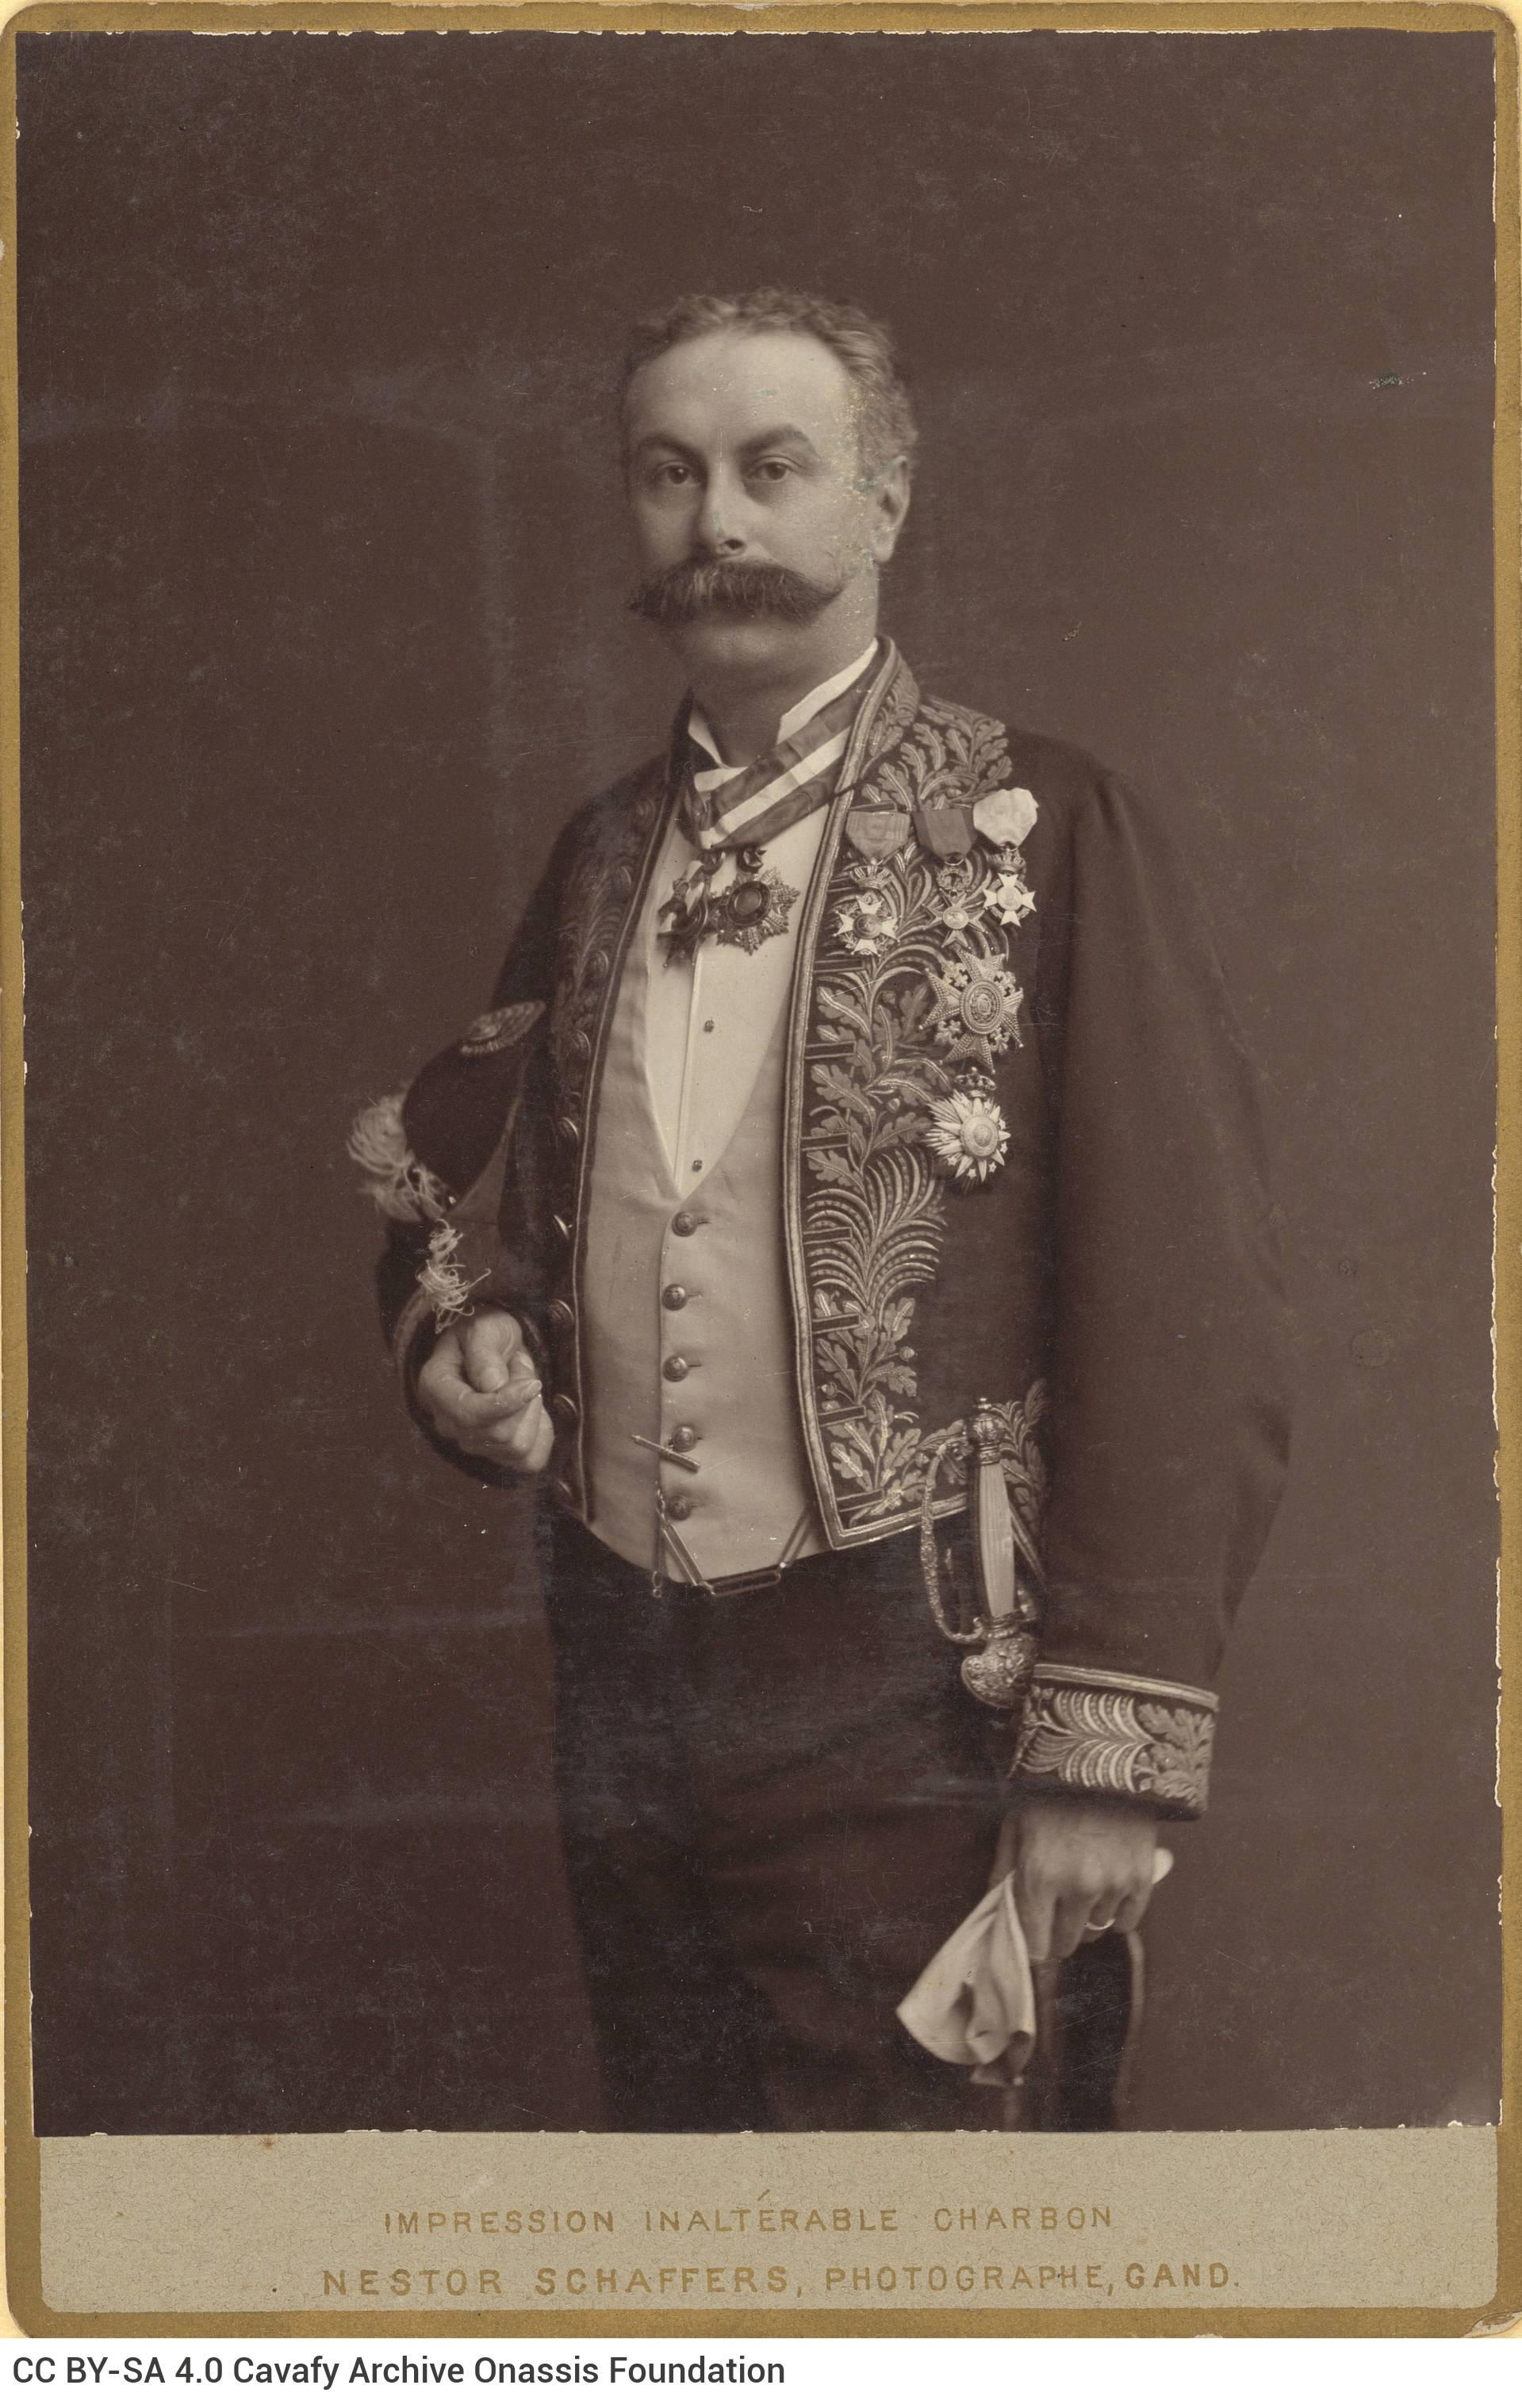 Photograph of Leon Verhaeghe de Naeyer, husband of the poet's aunt, Sévastie Photiadés, in an official ambassadorial unifor